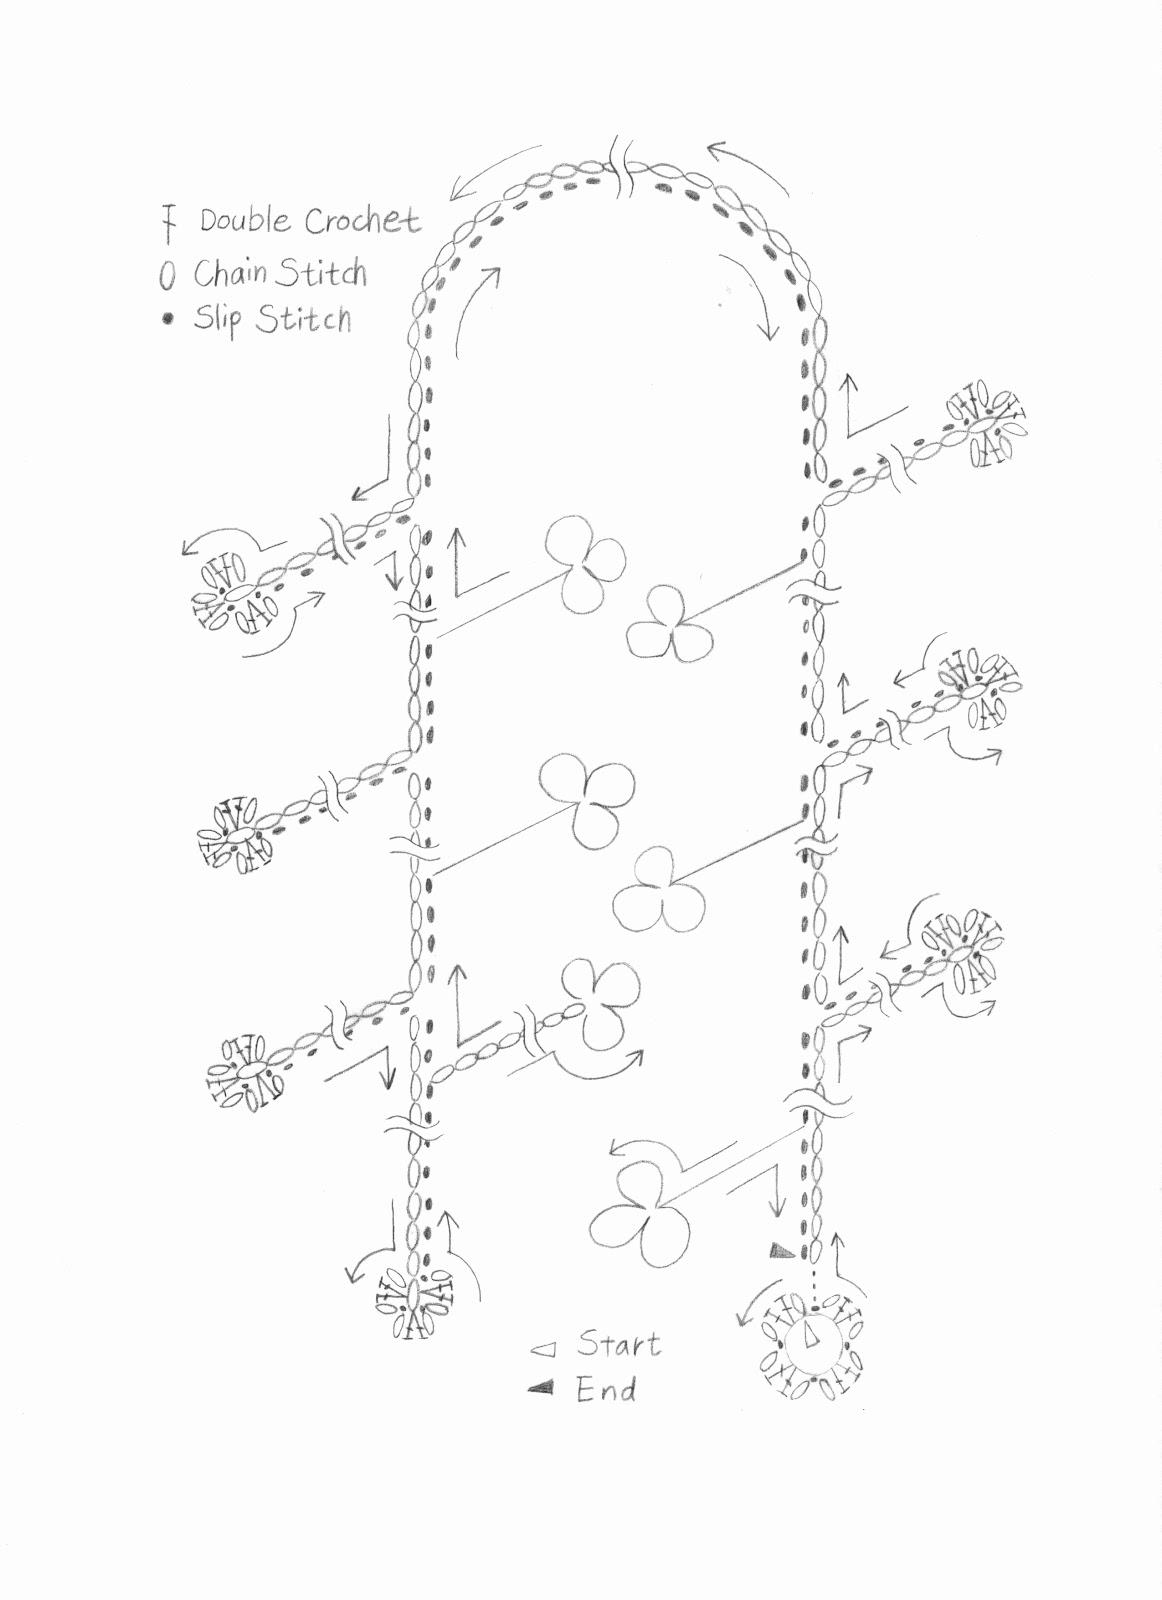 Crochet a Clover: Make a Shamrock for St. Patrick's Day